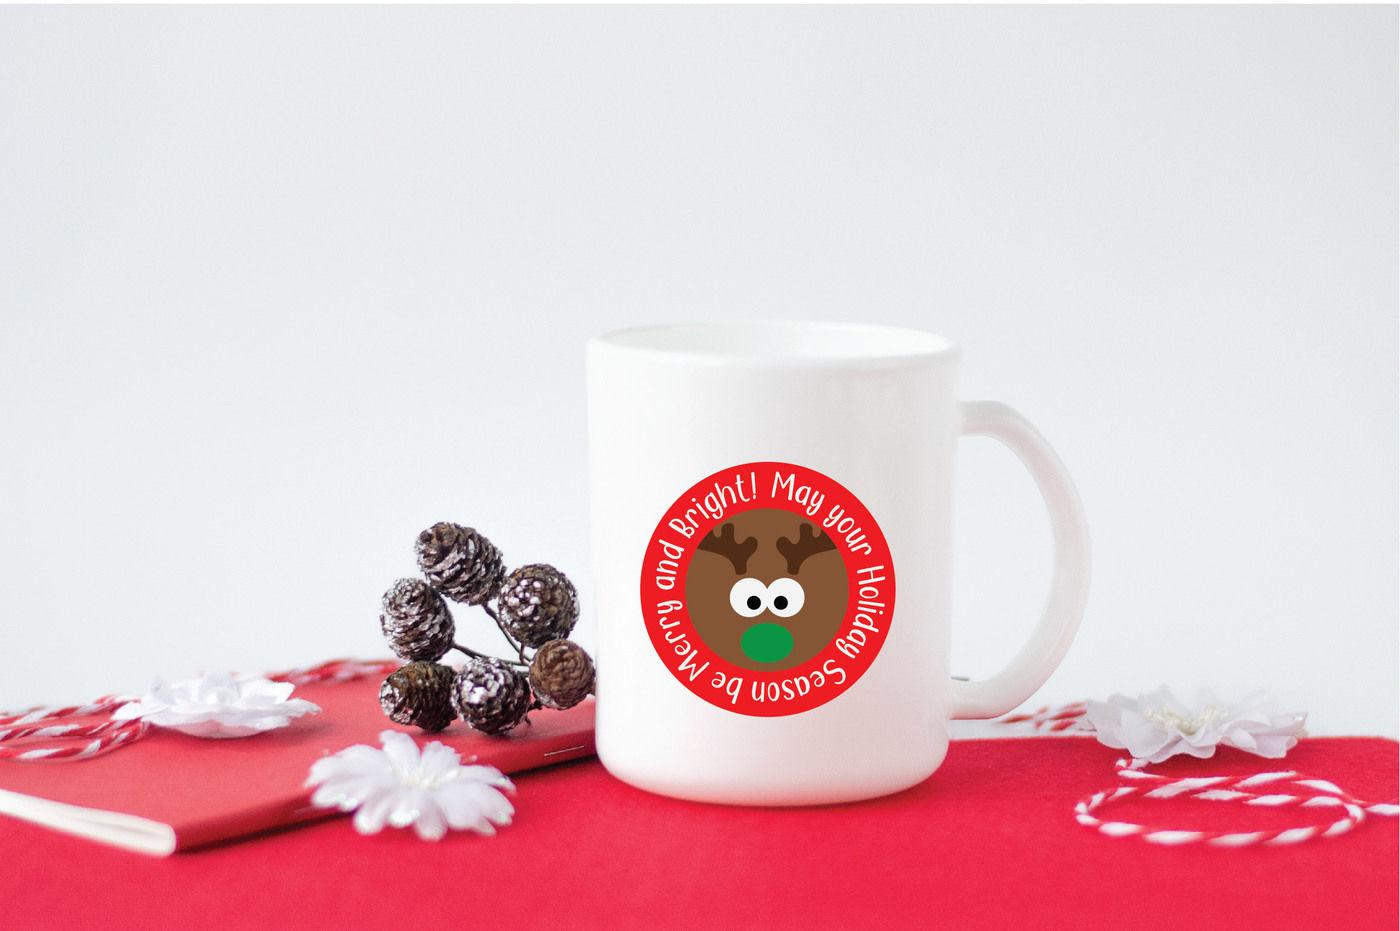 Reindeer Svg Cut File Christmas Svg Dxf Eps Png By Shannon Keyser Thehungryjpeg Com